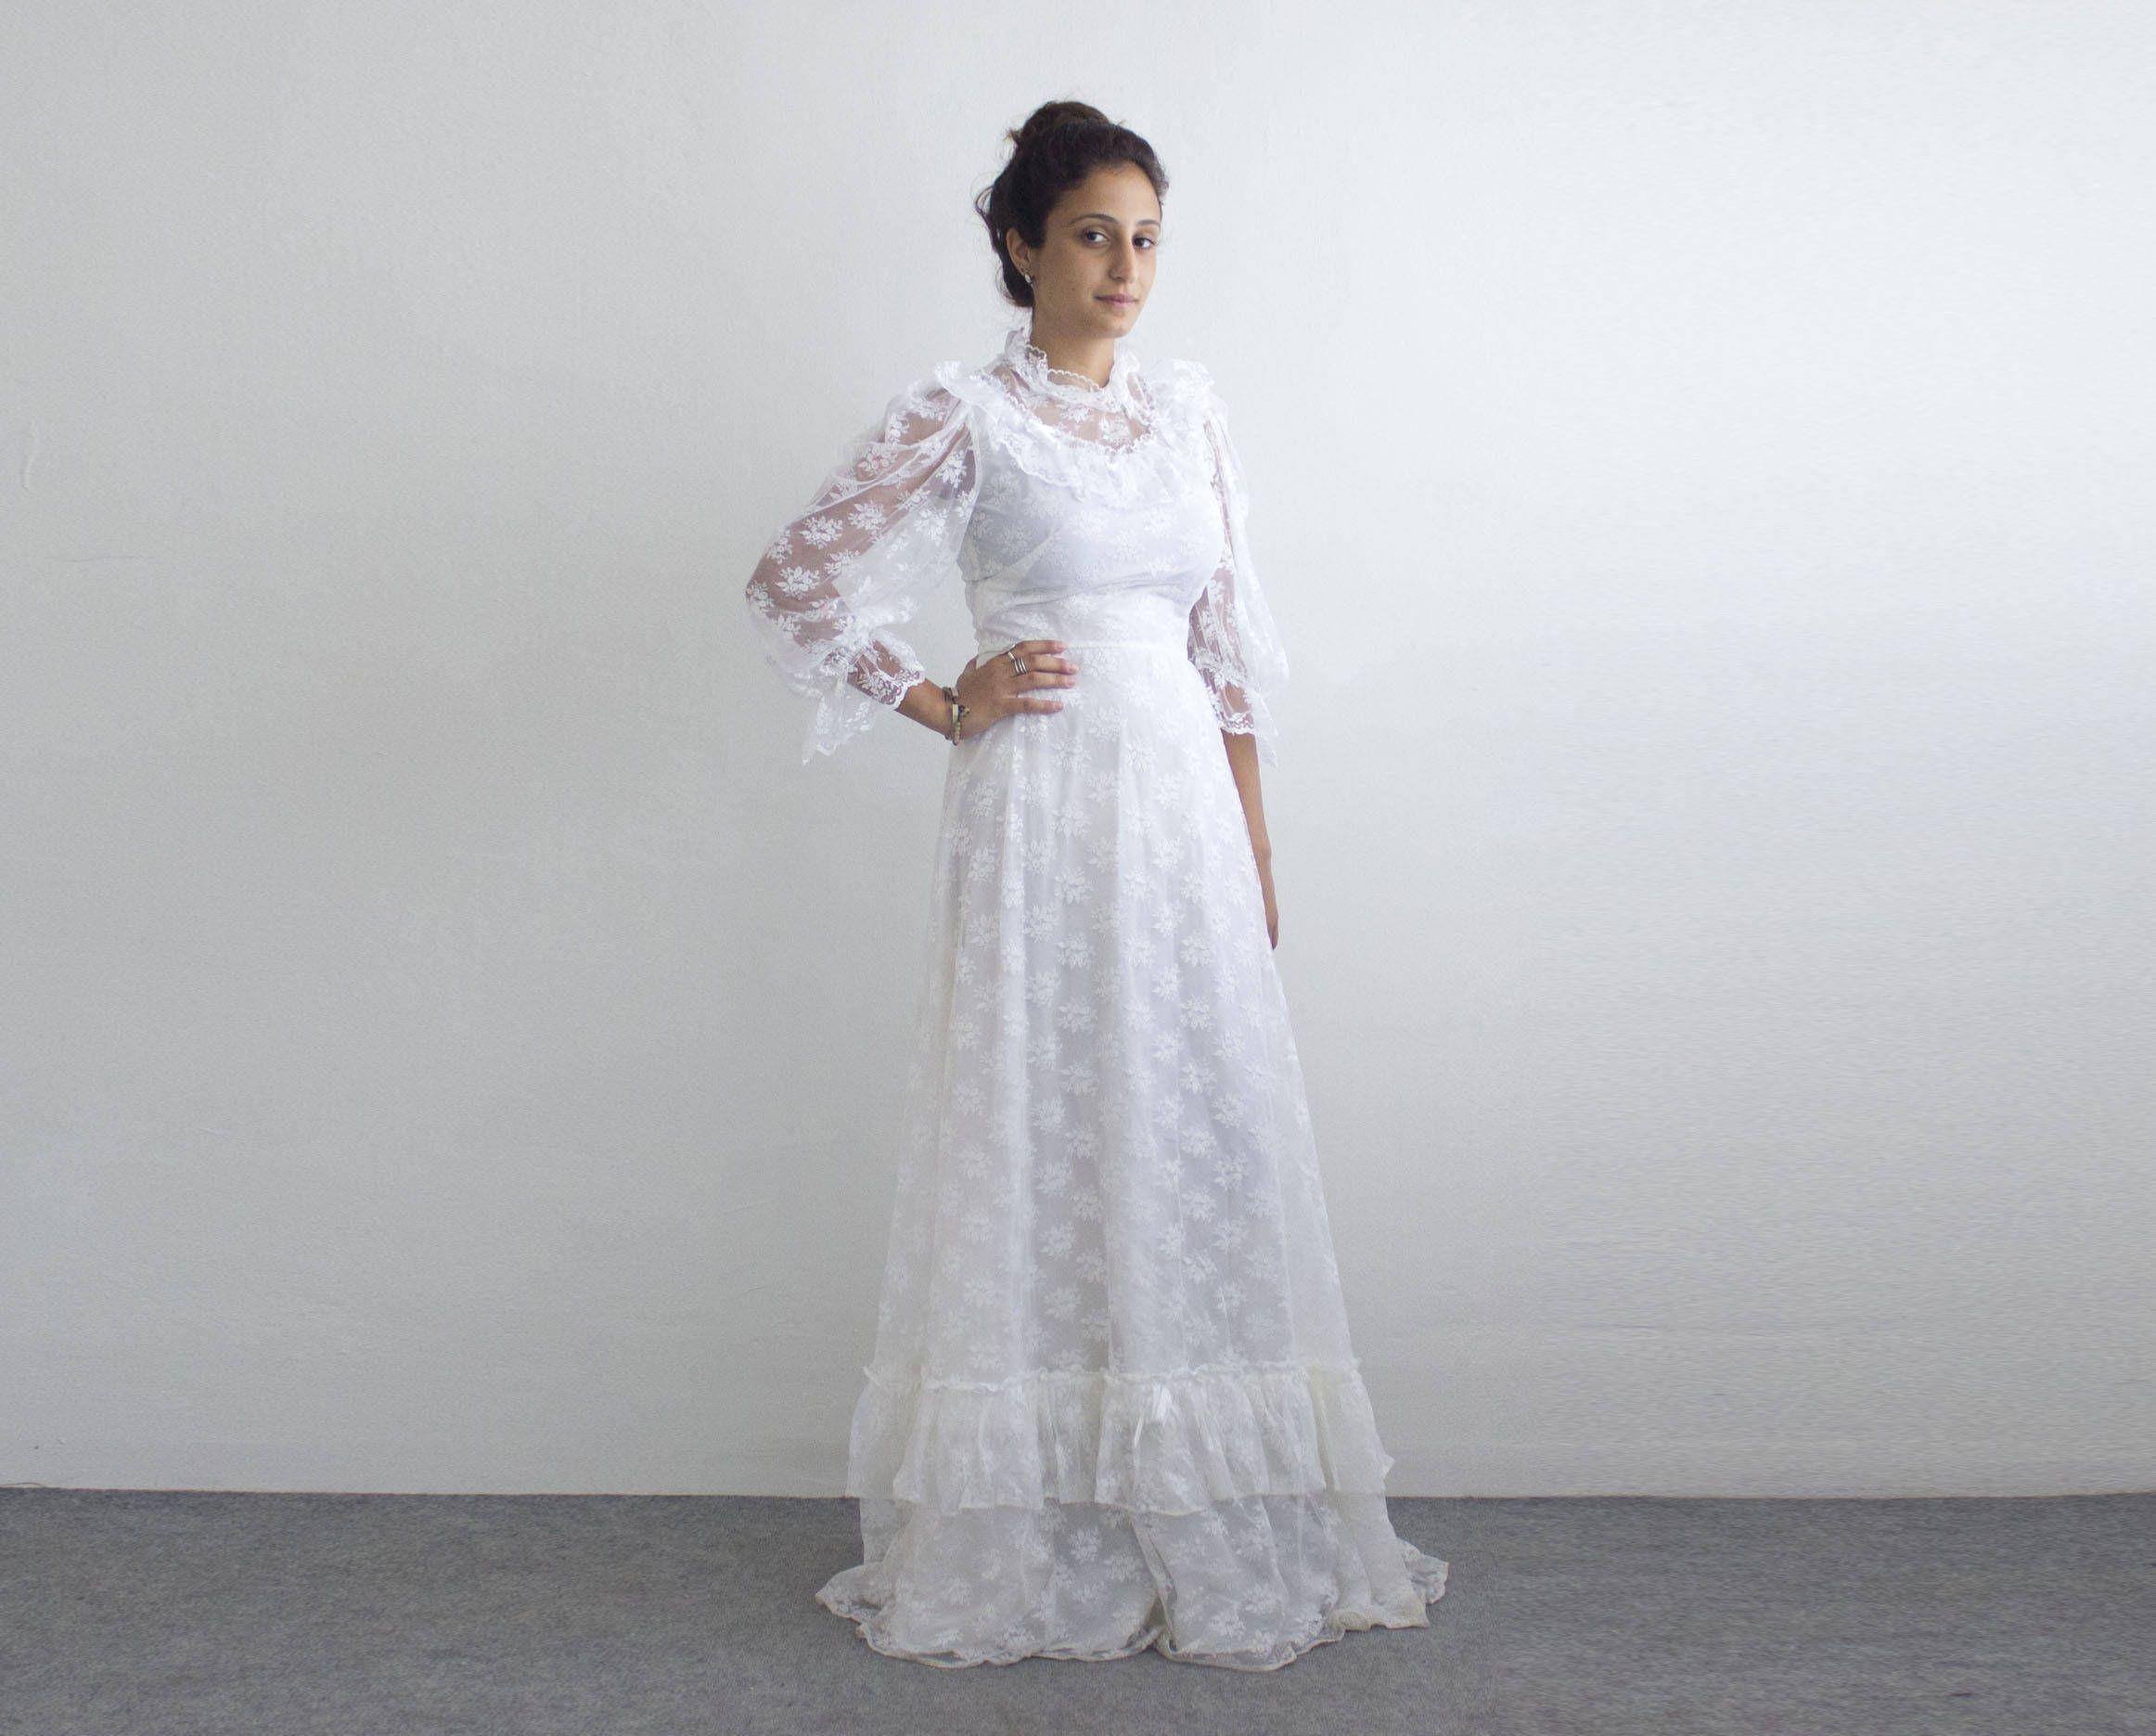 Vintage Wedding Dress 80s Nina Ricci Wedding Gown Vintage White Lace Dress Crinoline Long Vintage White Lace Dress Wedding Dresses Vintage Lace White Dress [ 1871 x 2324 Pixel ]